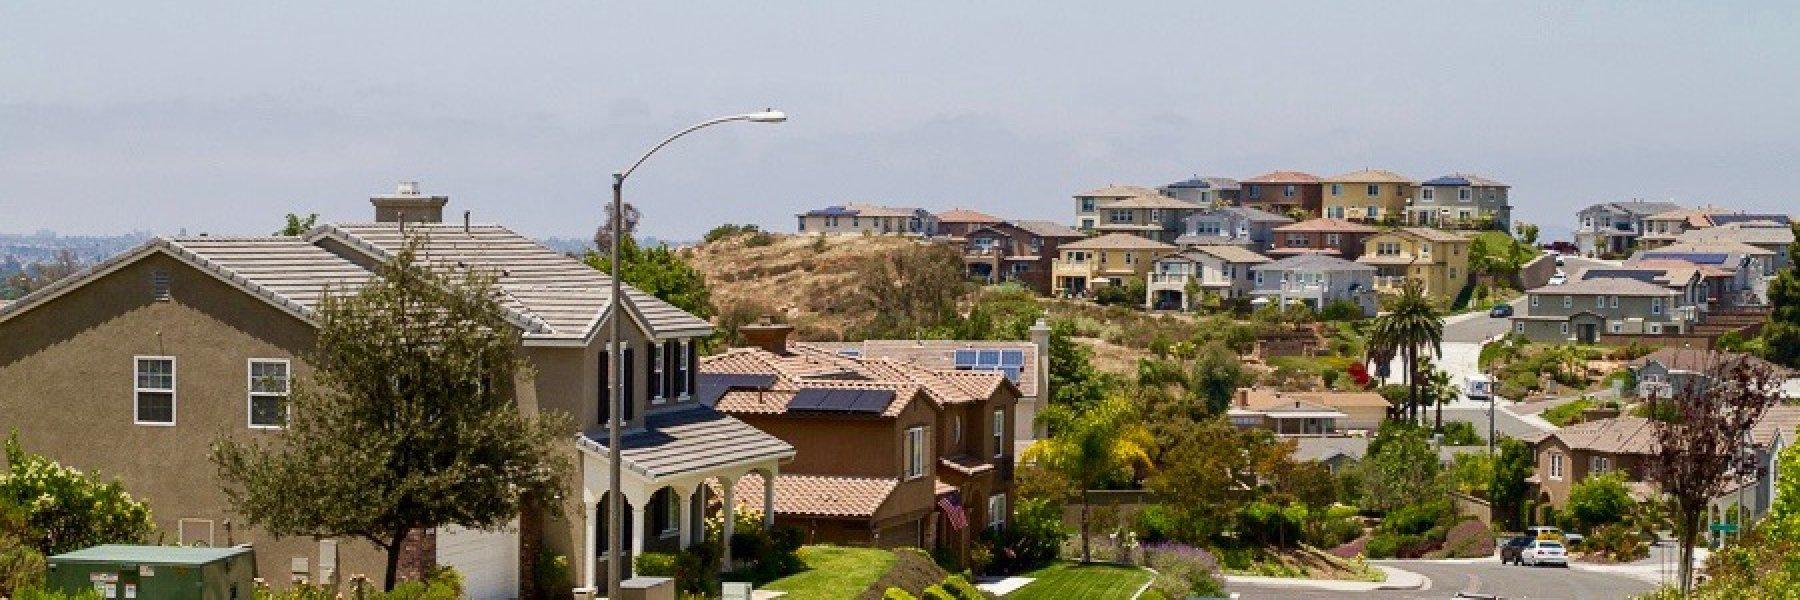 Serramar is a community of homes in La Mesa California